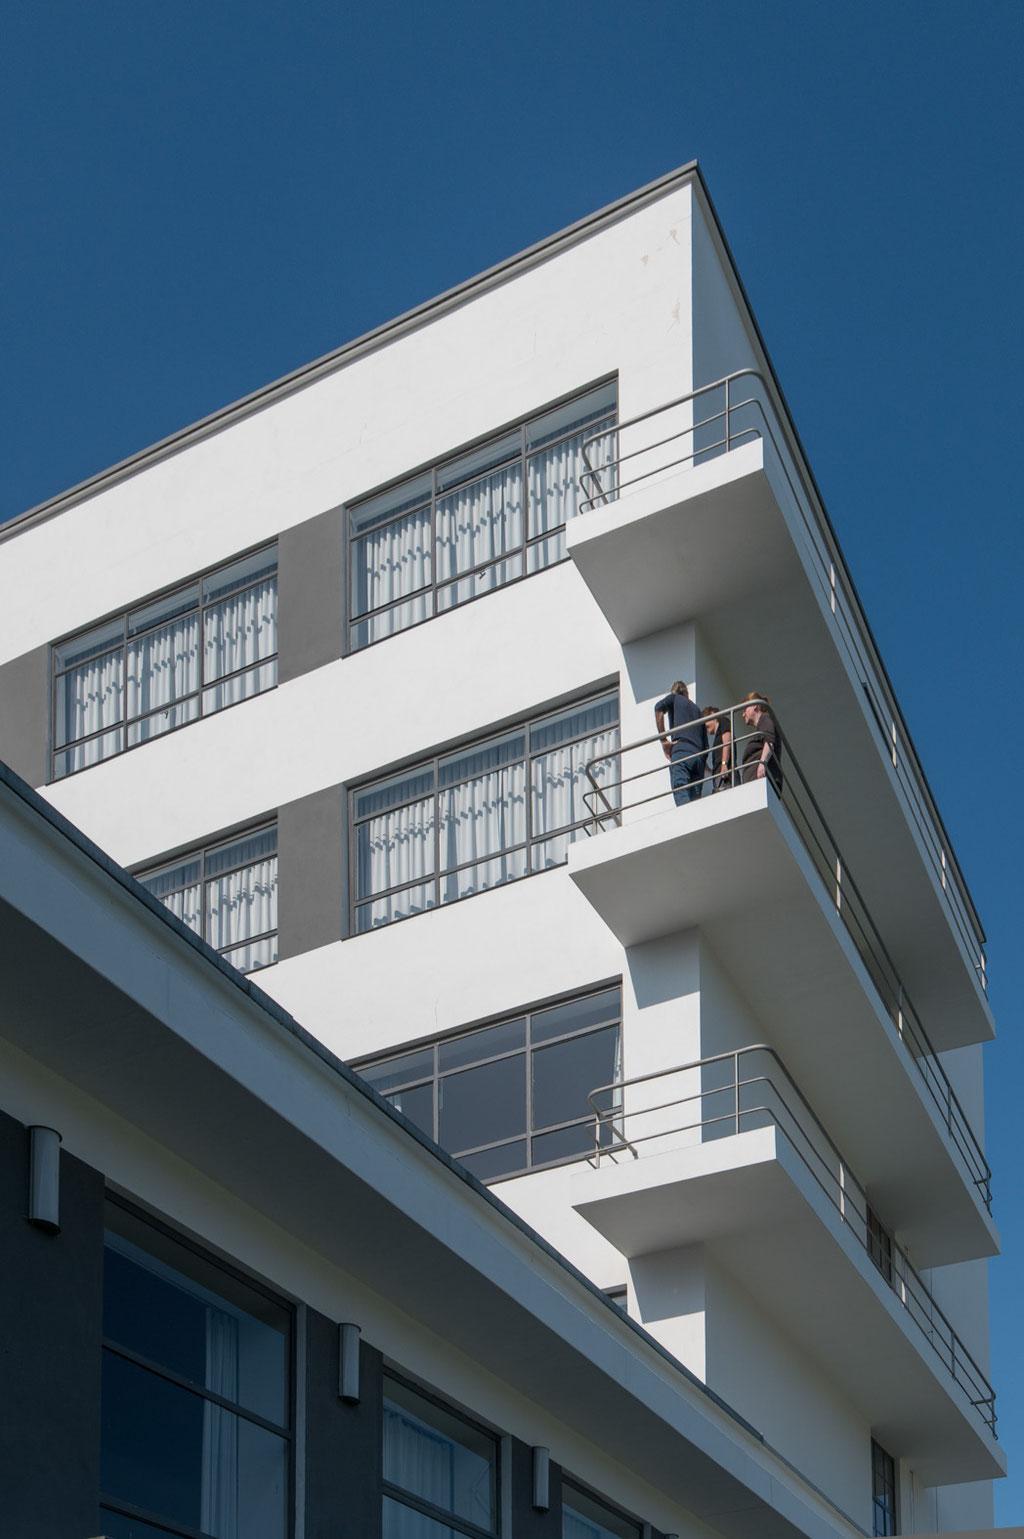 Ateliergebäude (Walter Gropius), Dessau (D)